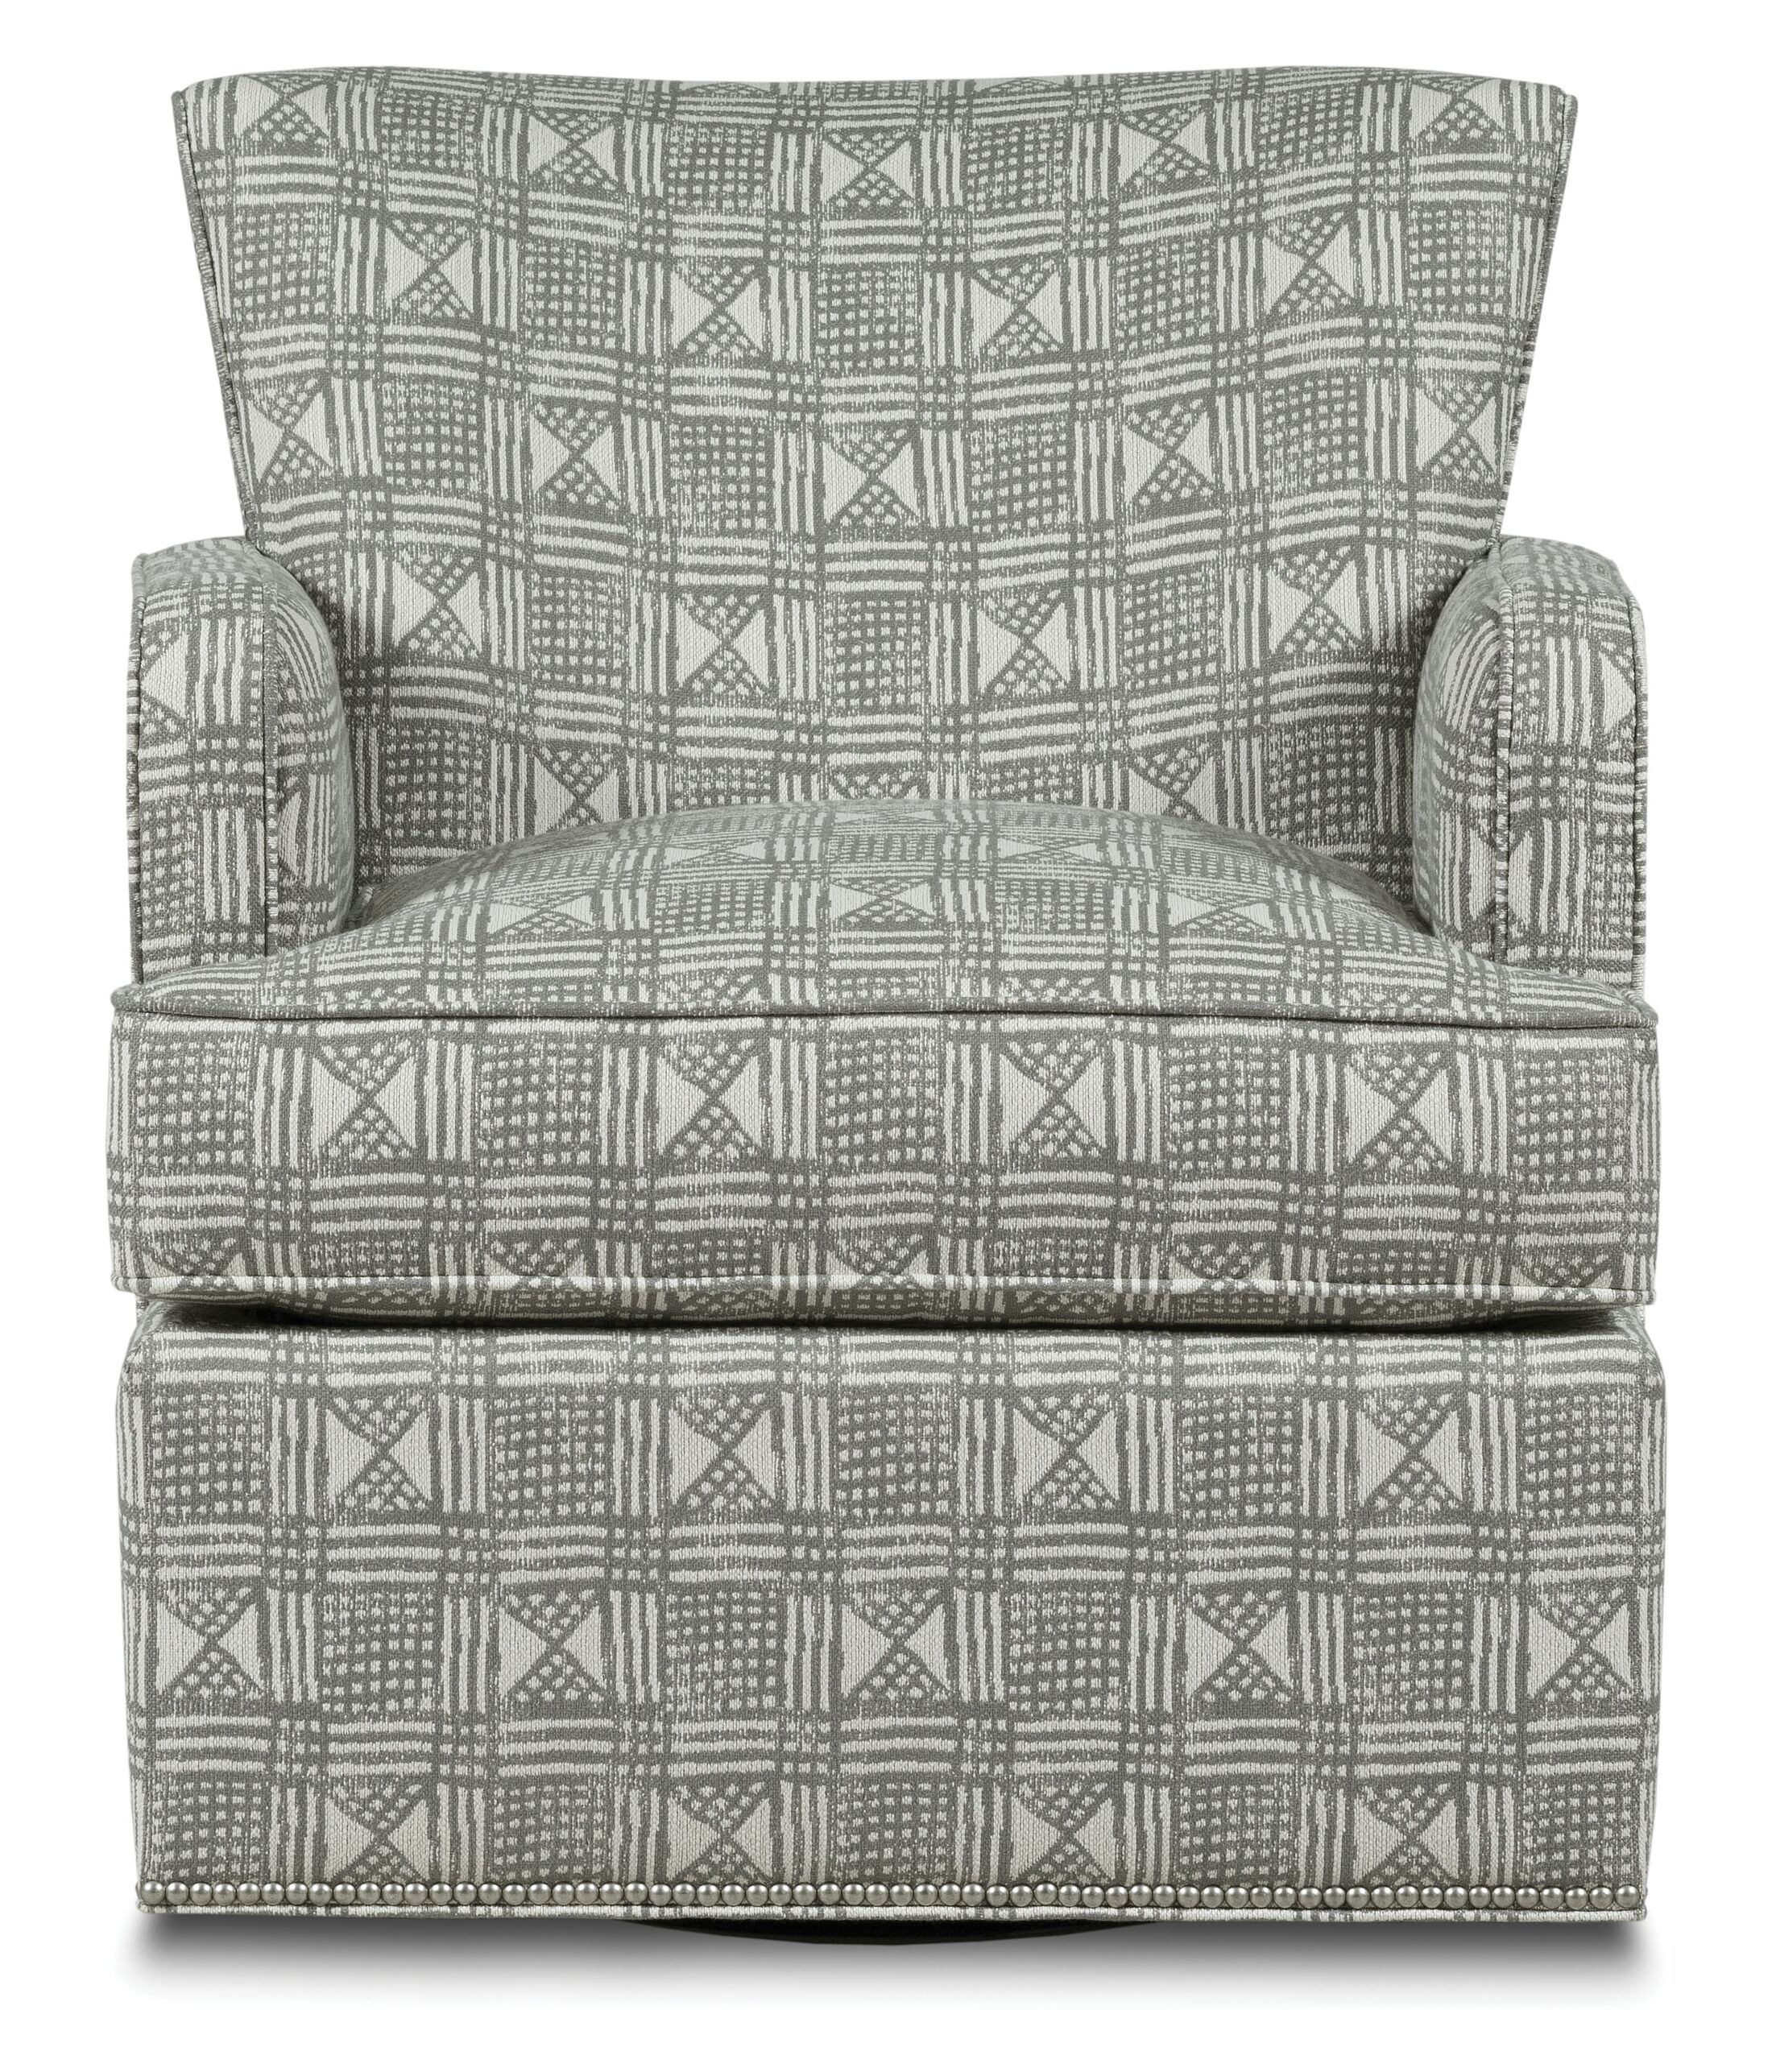 Blaire Swivel Armchair Body Fabric: 9691 Mist